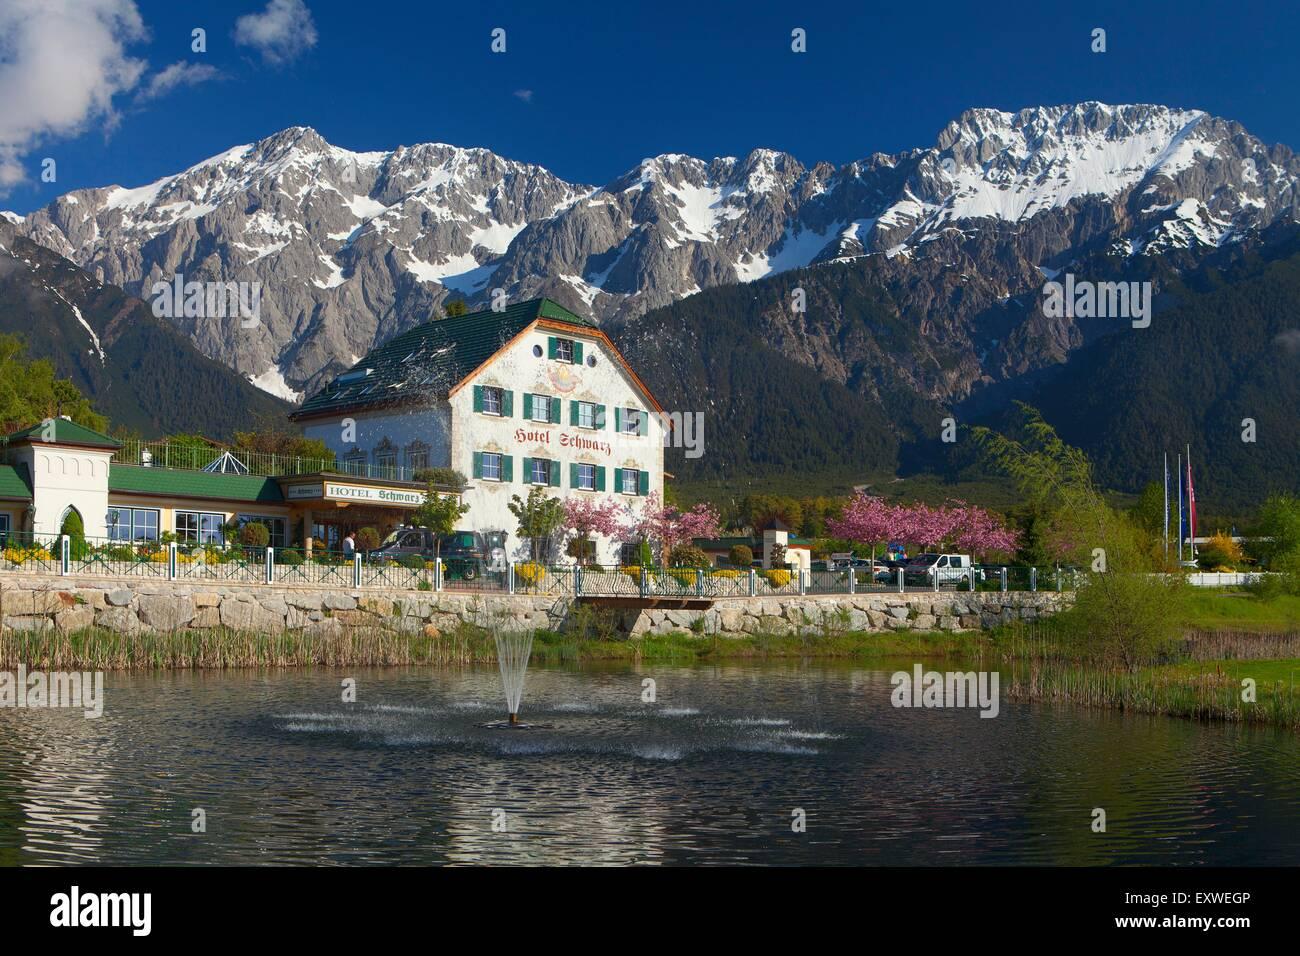 Hotel Schwarz in Mieming, Tyrol, Austria - Stock Image